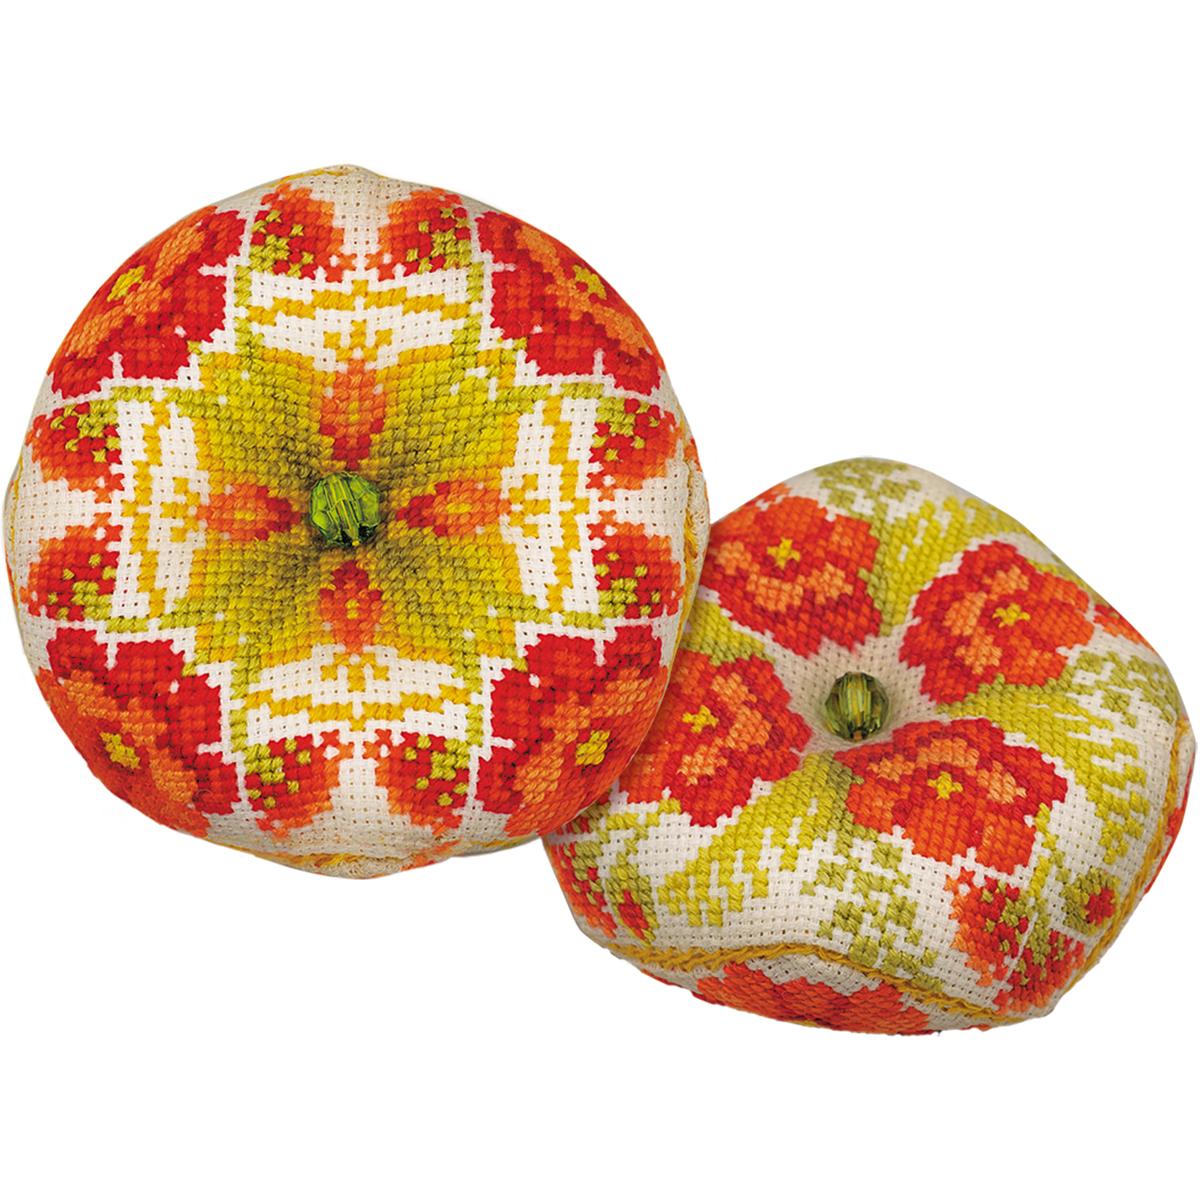 Biscournu Poppies Counted Cross Stitch Kit -  RIOLIS, R1620AC